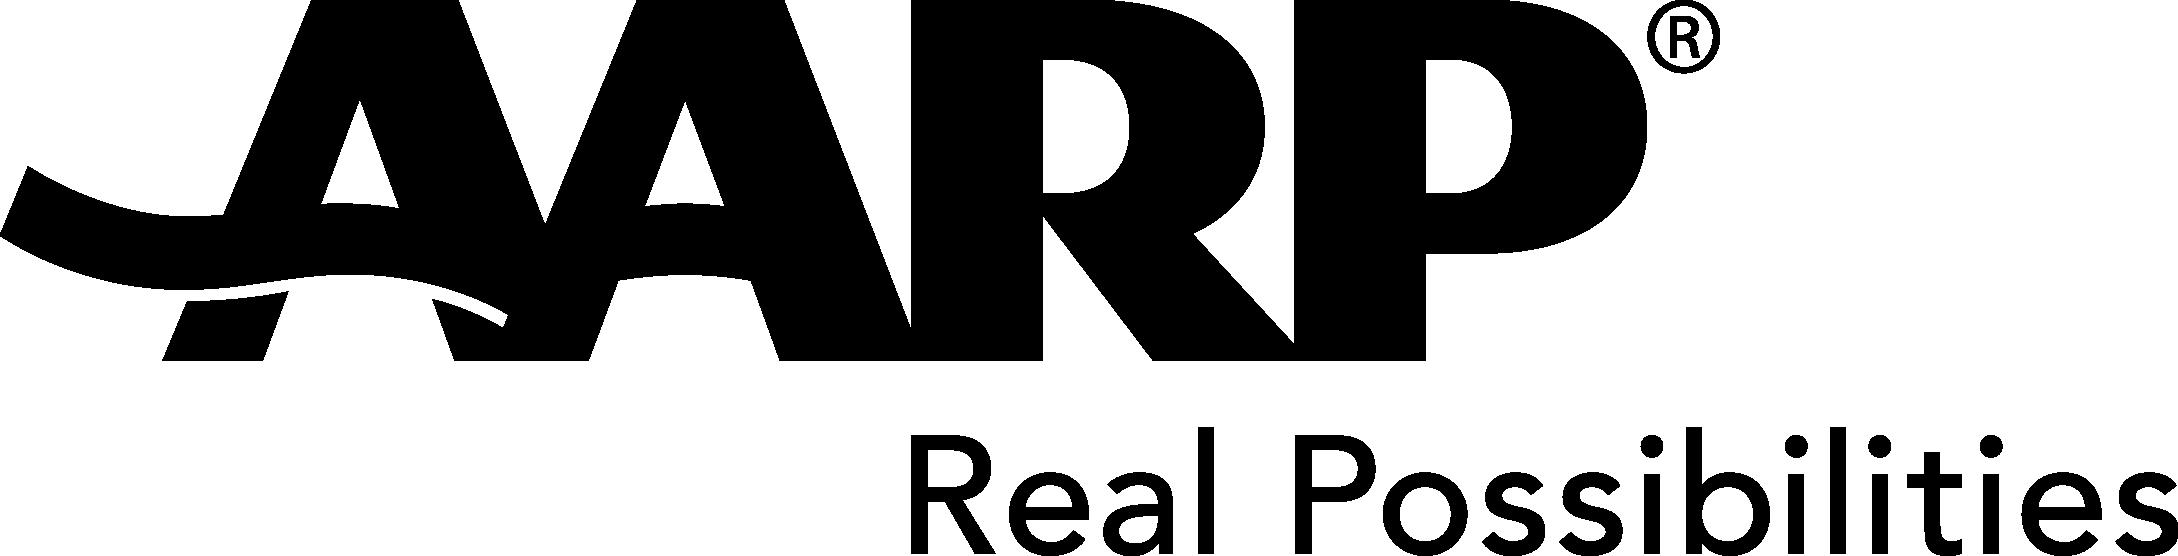 AARP-RP-aligned_K.png